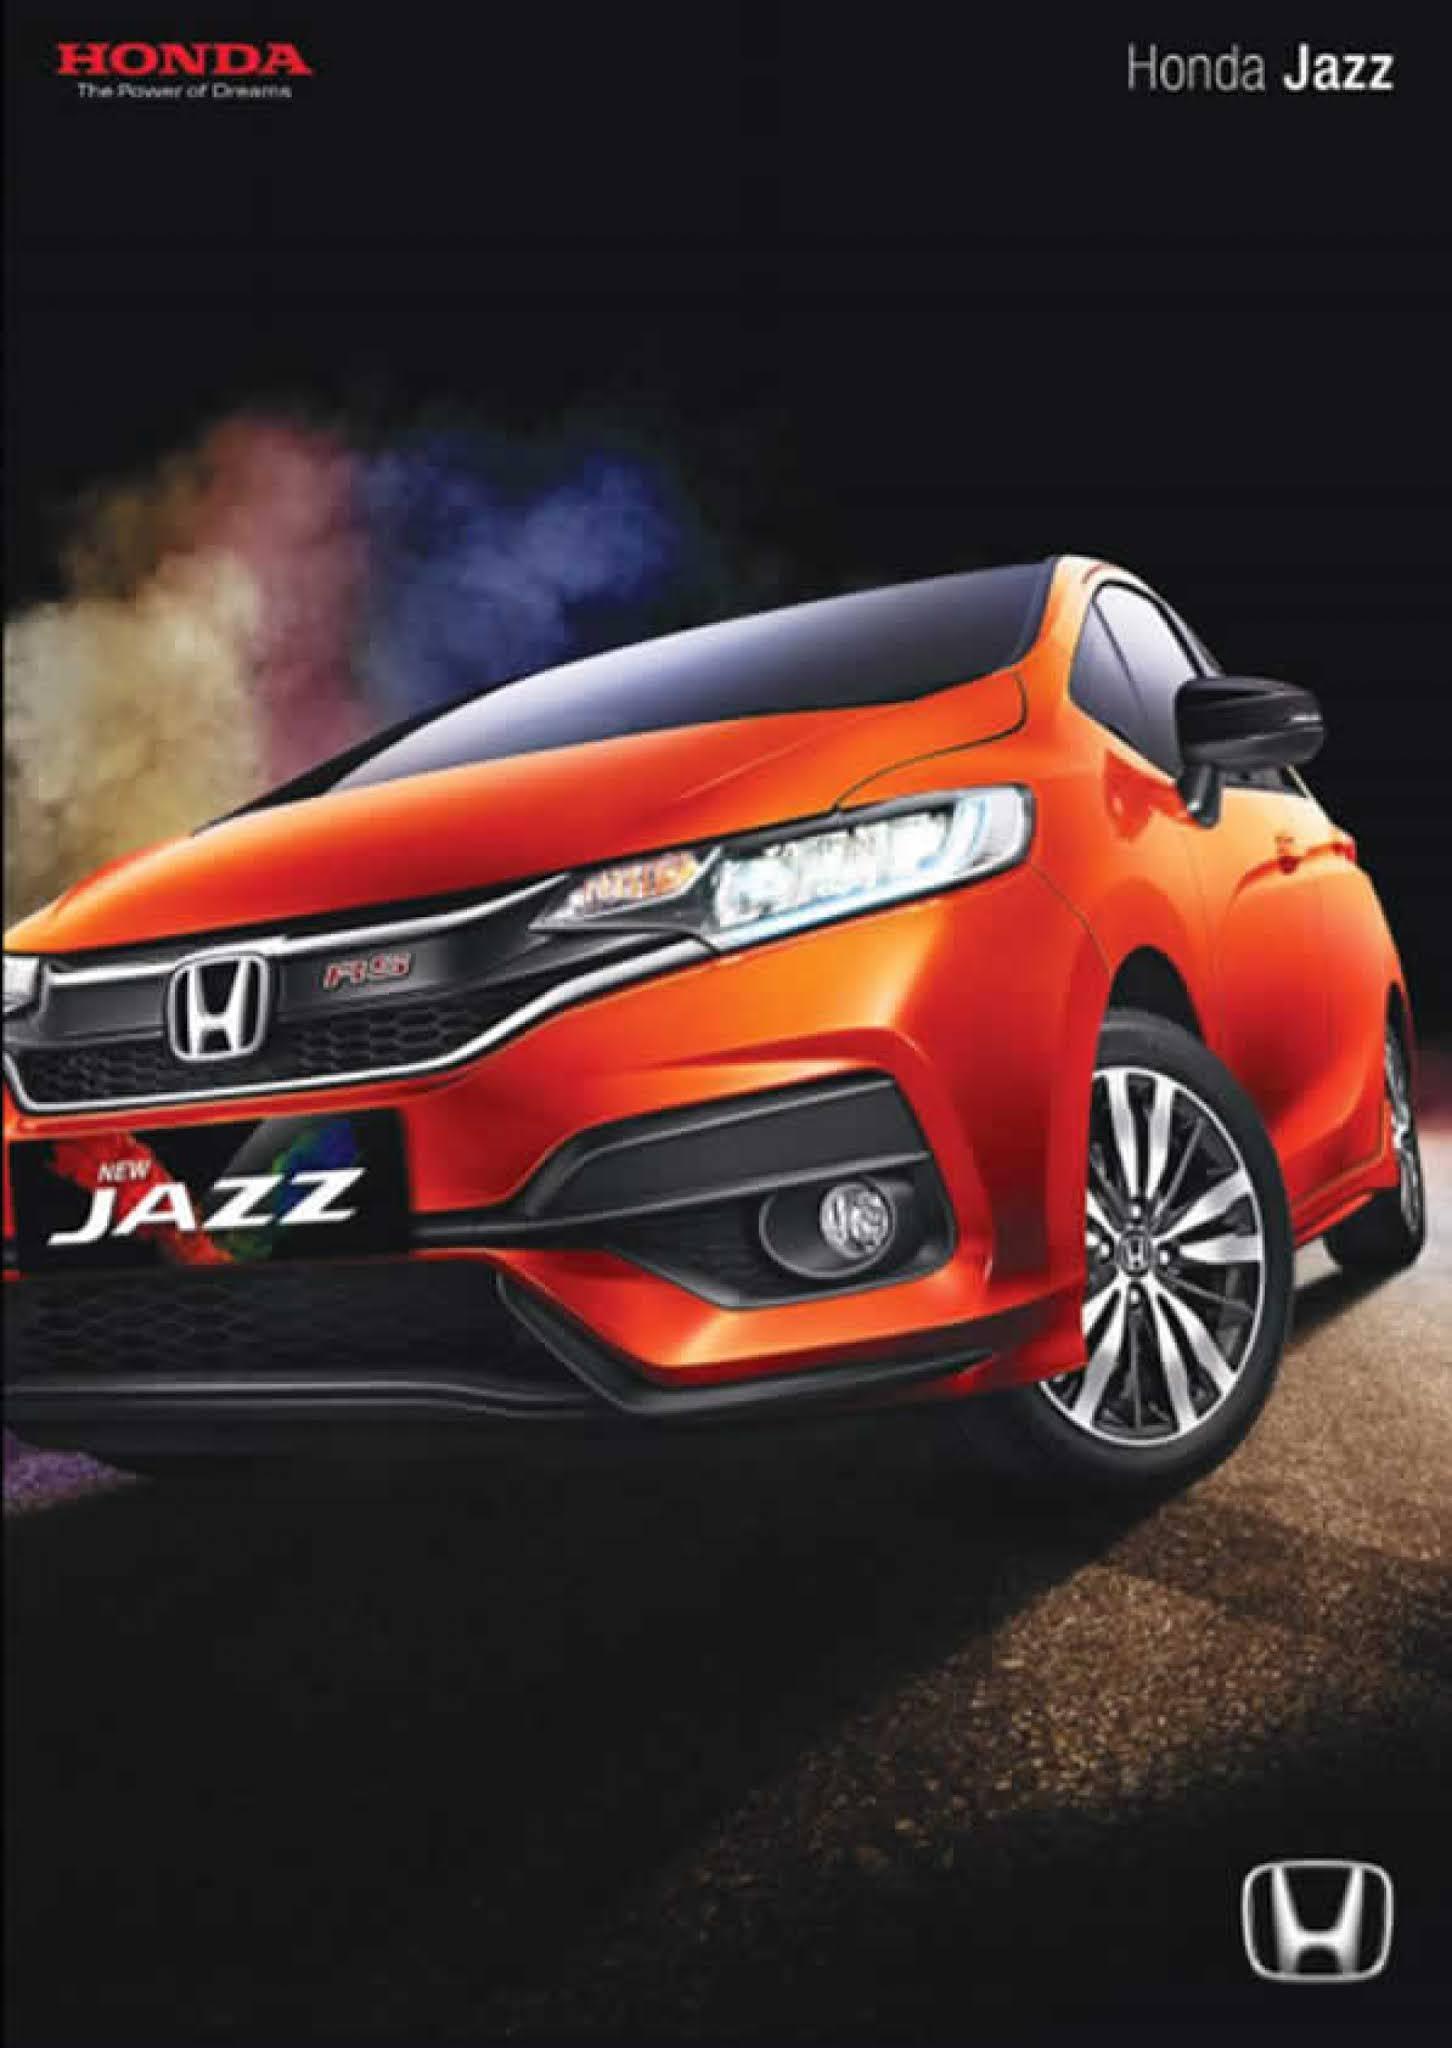 Harga Honda Jazz Pekanbaru Riau Terbaru Bulan ini 2021